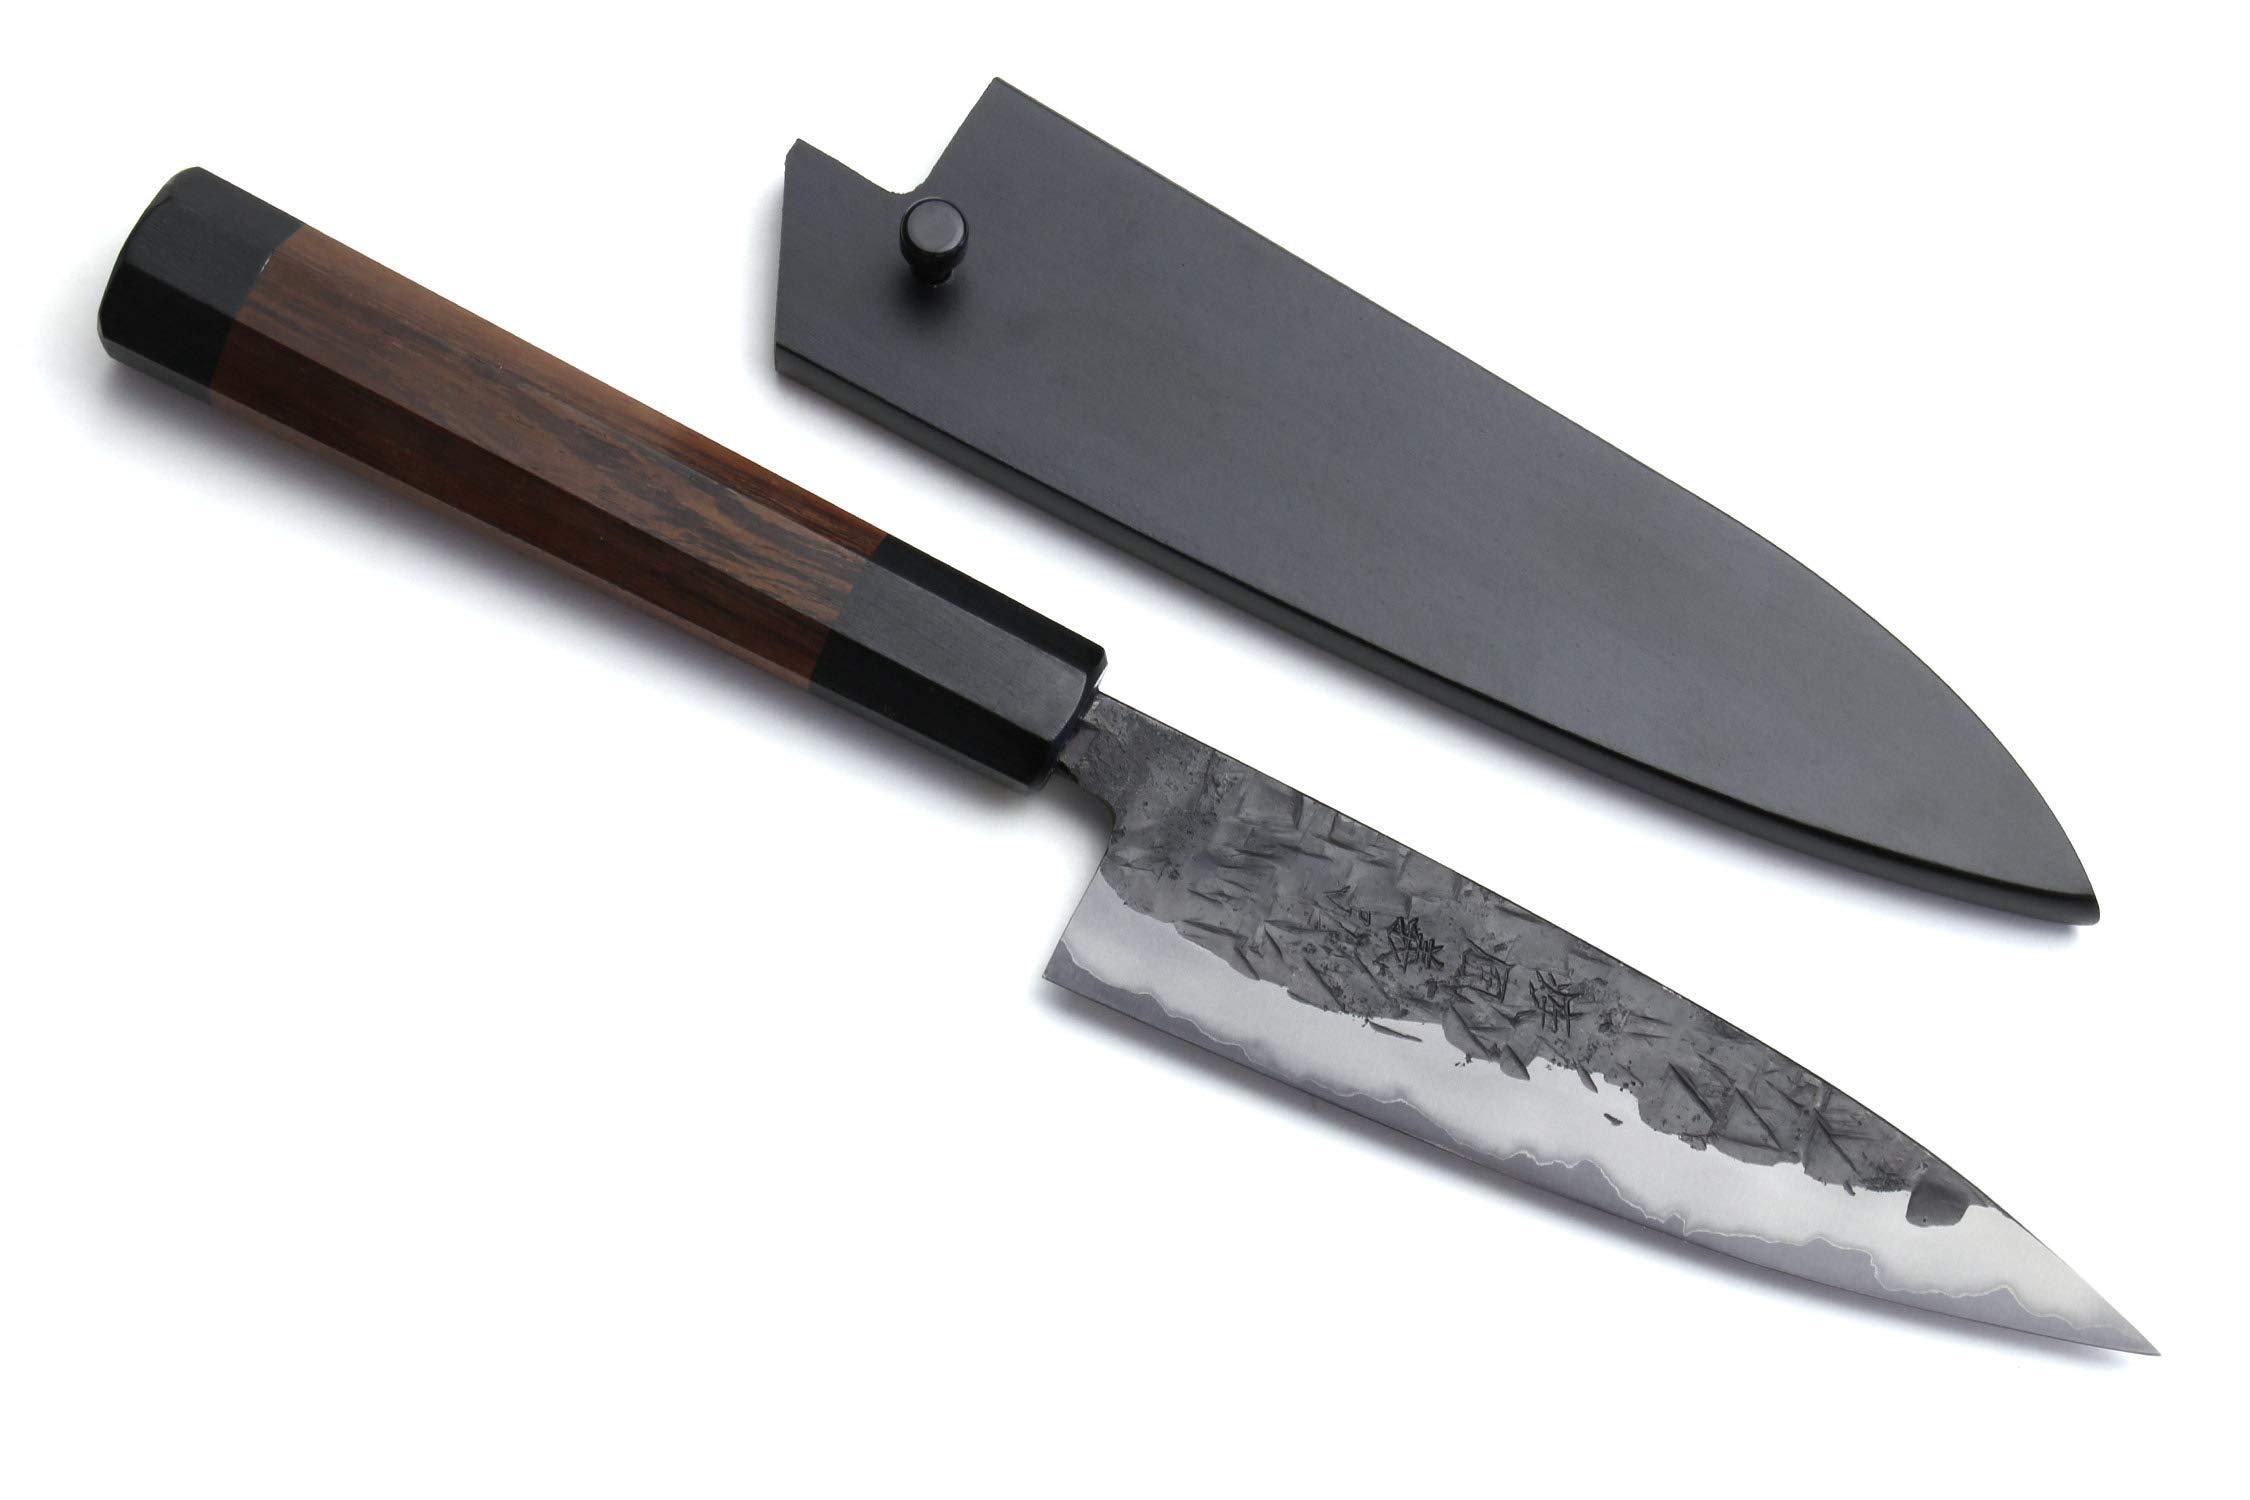 Yoshihiro Nashiji Kurouchi Blue Steel #2 Stainless Clad Petty Utility Knife (5.3'' (135mm)) by Yoshihiro